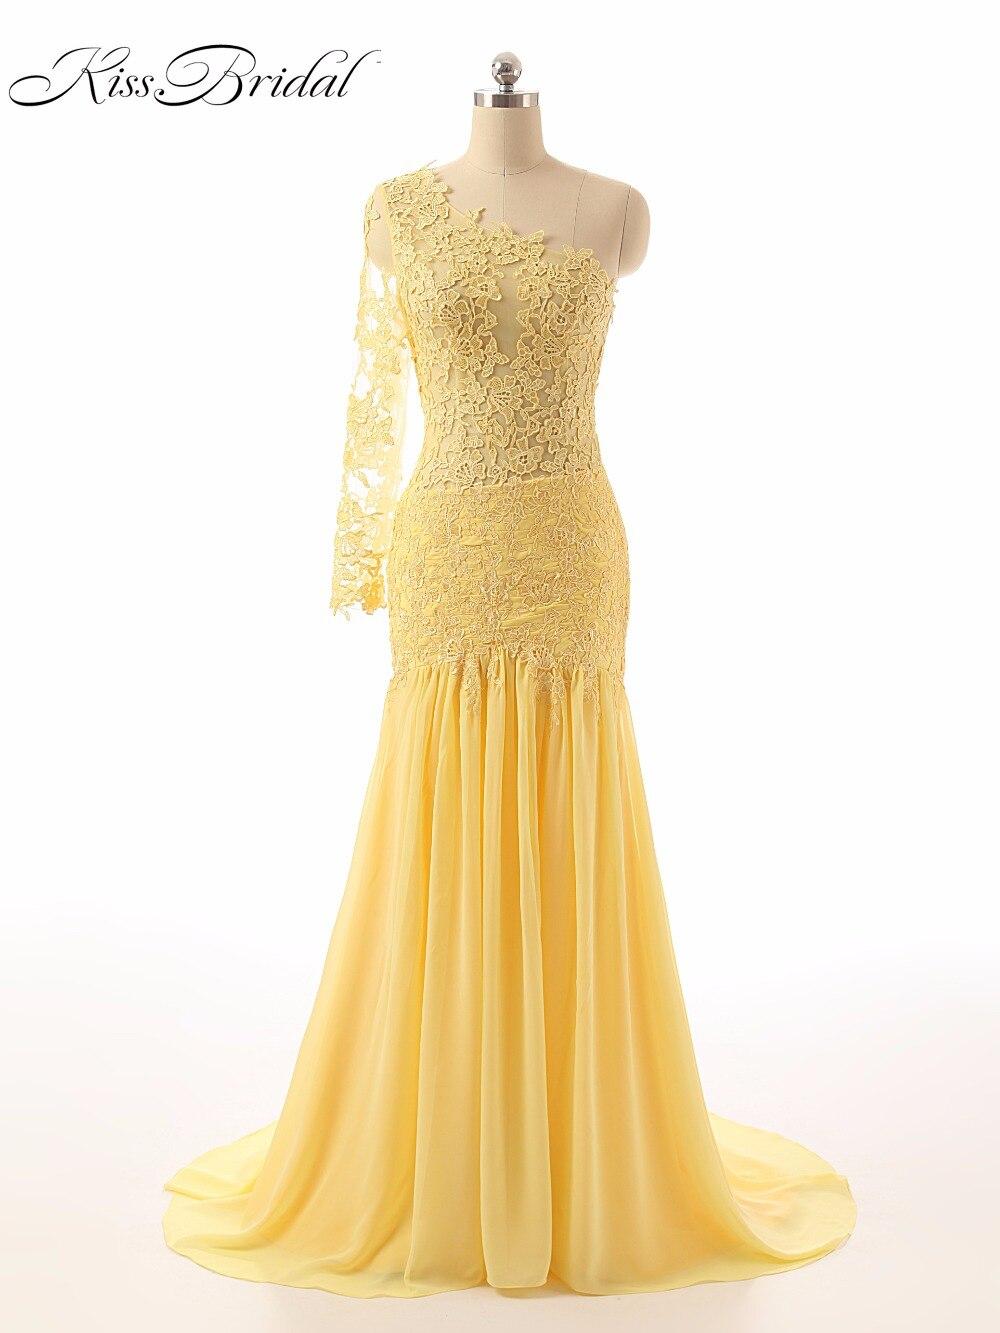 font b Prom b font font b Dresses b font 2017 Vintage One Shoulder Lace